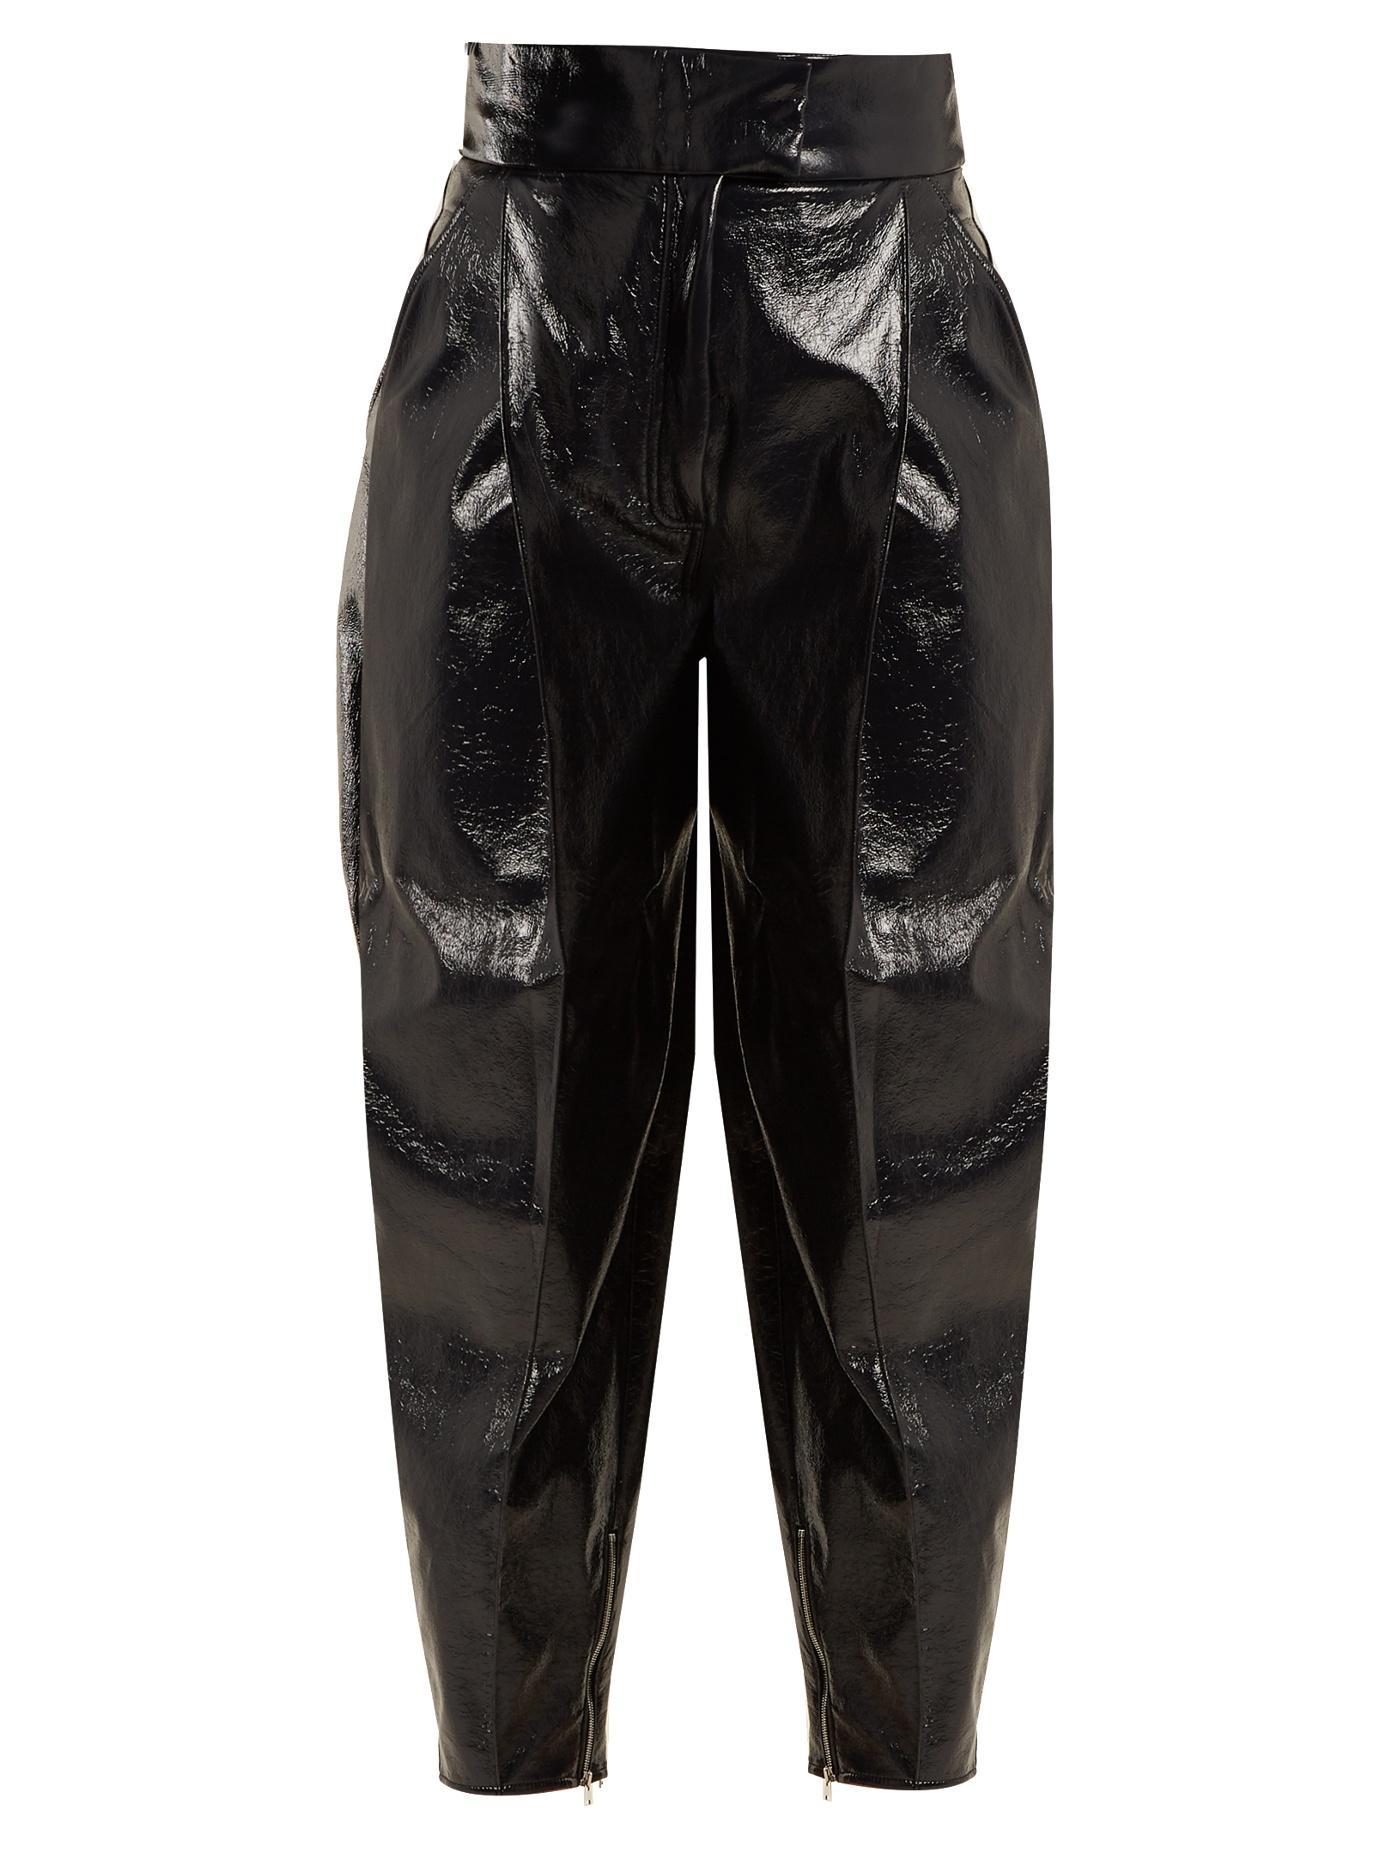 Wanda Nylon High-Rise Tapered-Leg Coated Trousers In Navy